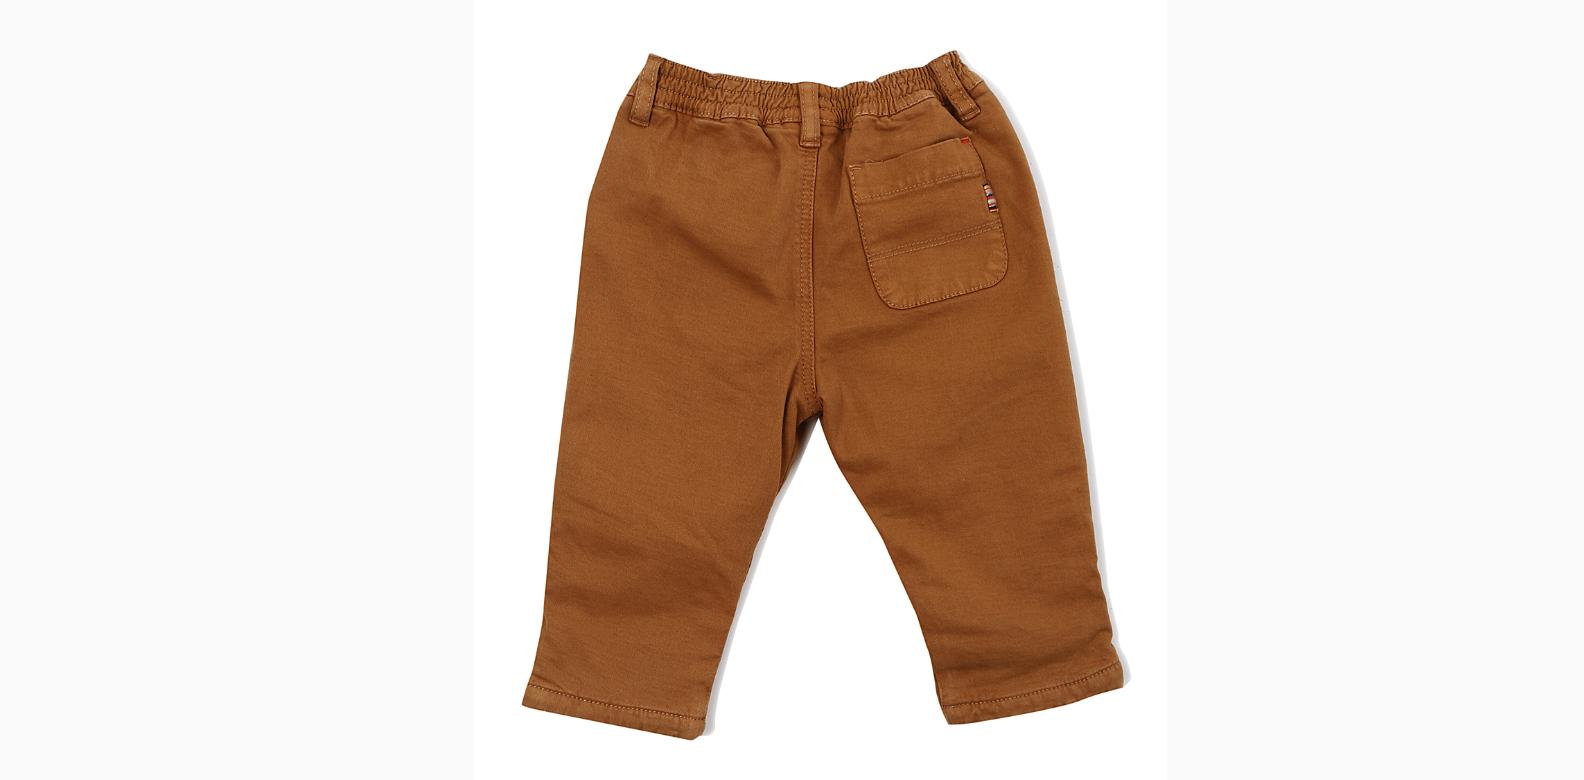 Paul Smith Junior baby pants; B1-59 The Shoppes at Marina Bay Sands